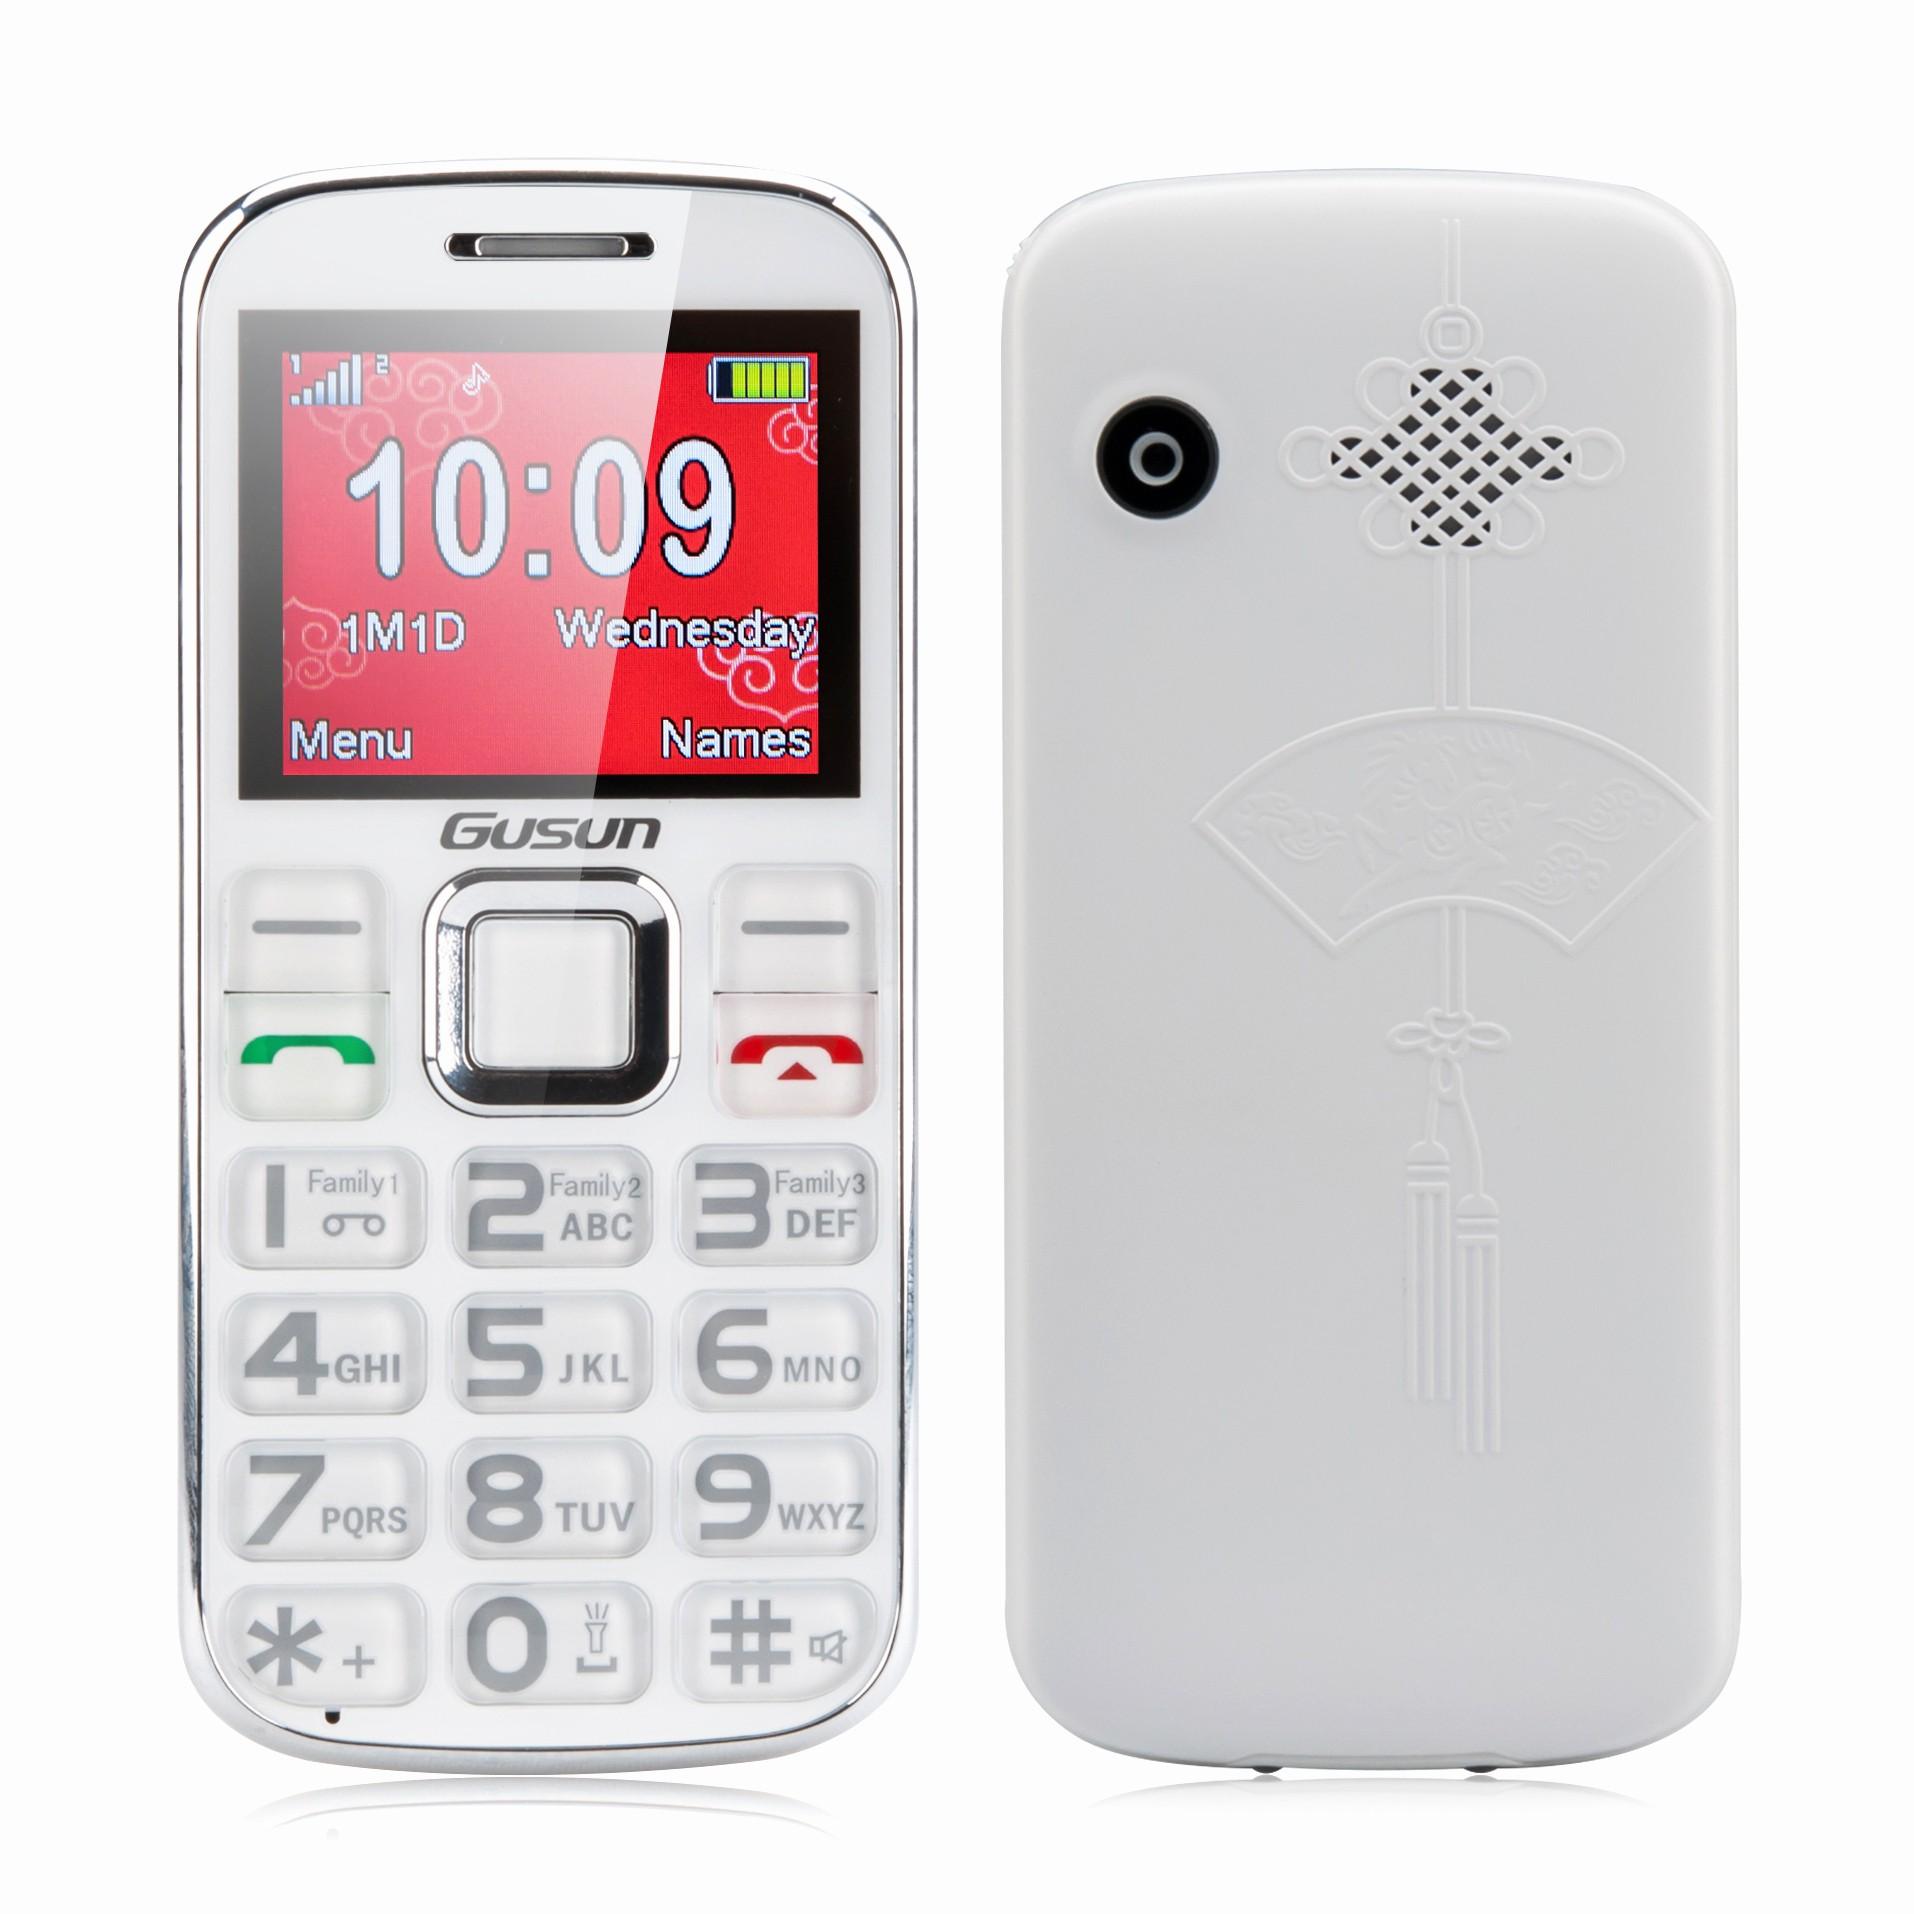 Electronic Address Book for Seniors Luxury Gusun F10 Dual Sim Senior Citizen Phone Quad Band 2 Inch